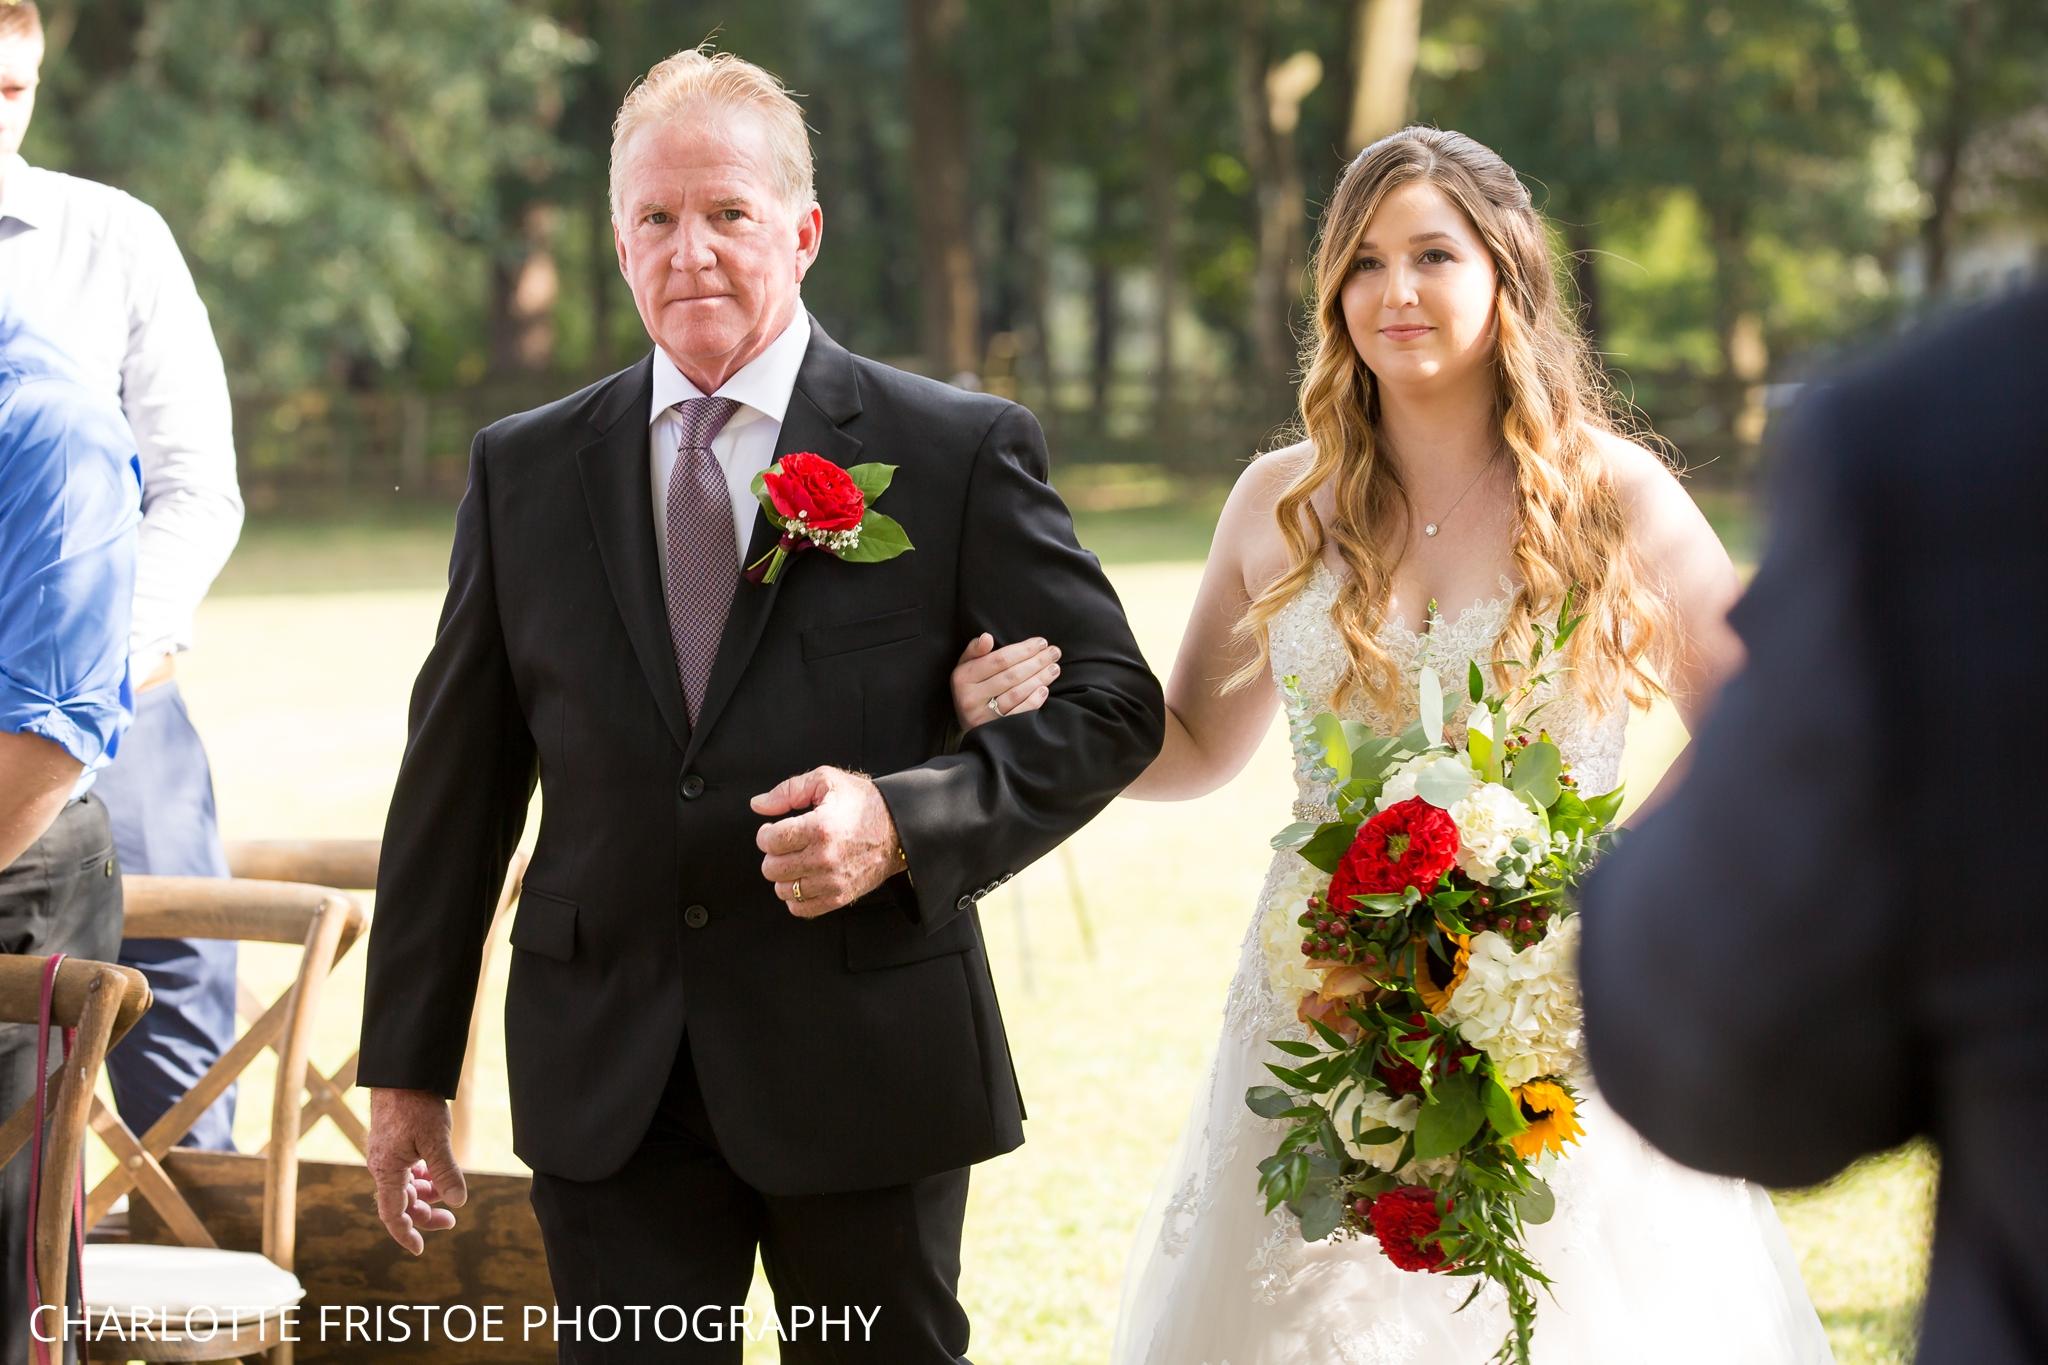 Tallahassee_Wedding_Charlotte_Fristoe-33.jpg